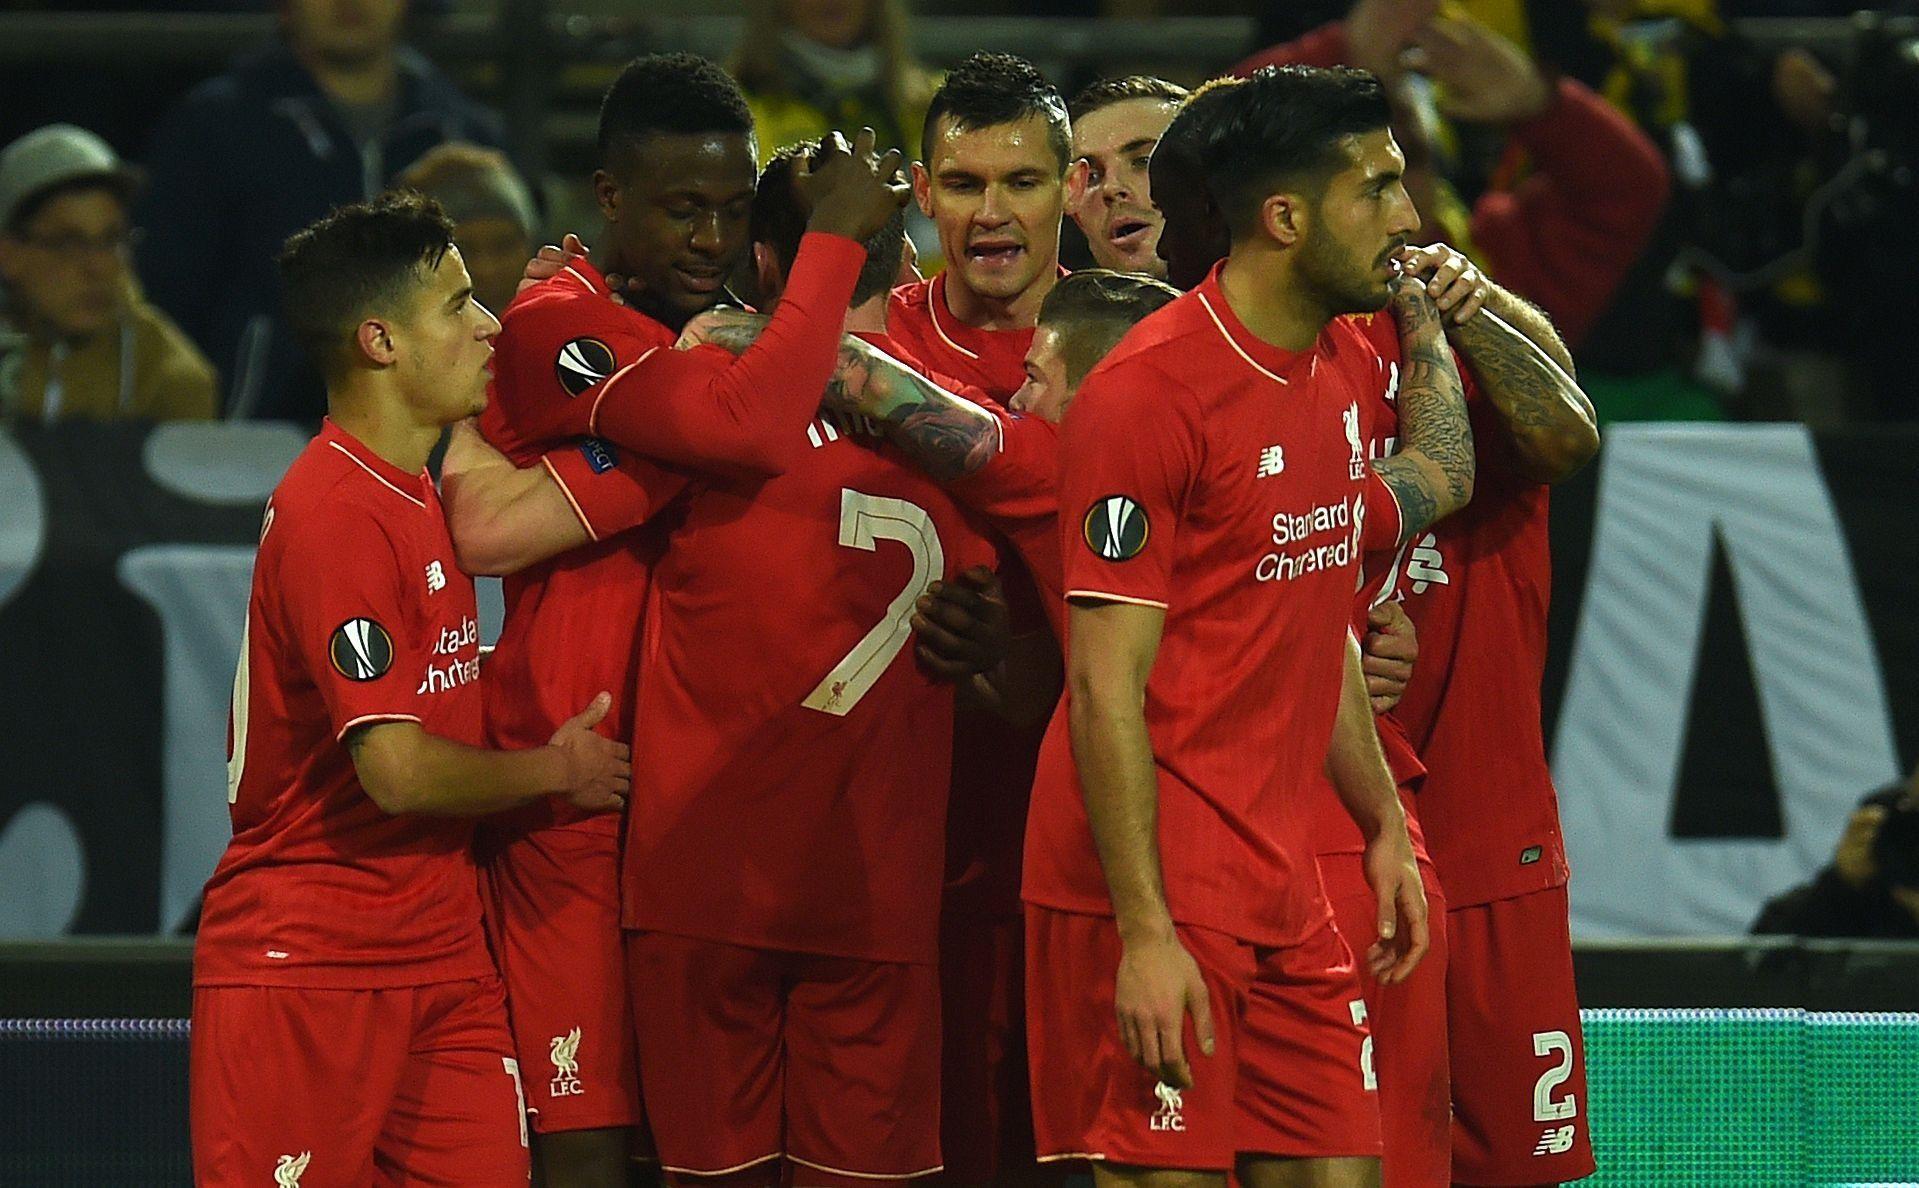 Liverpool vs. Dortmund